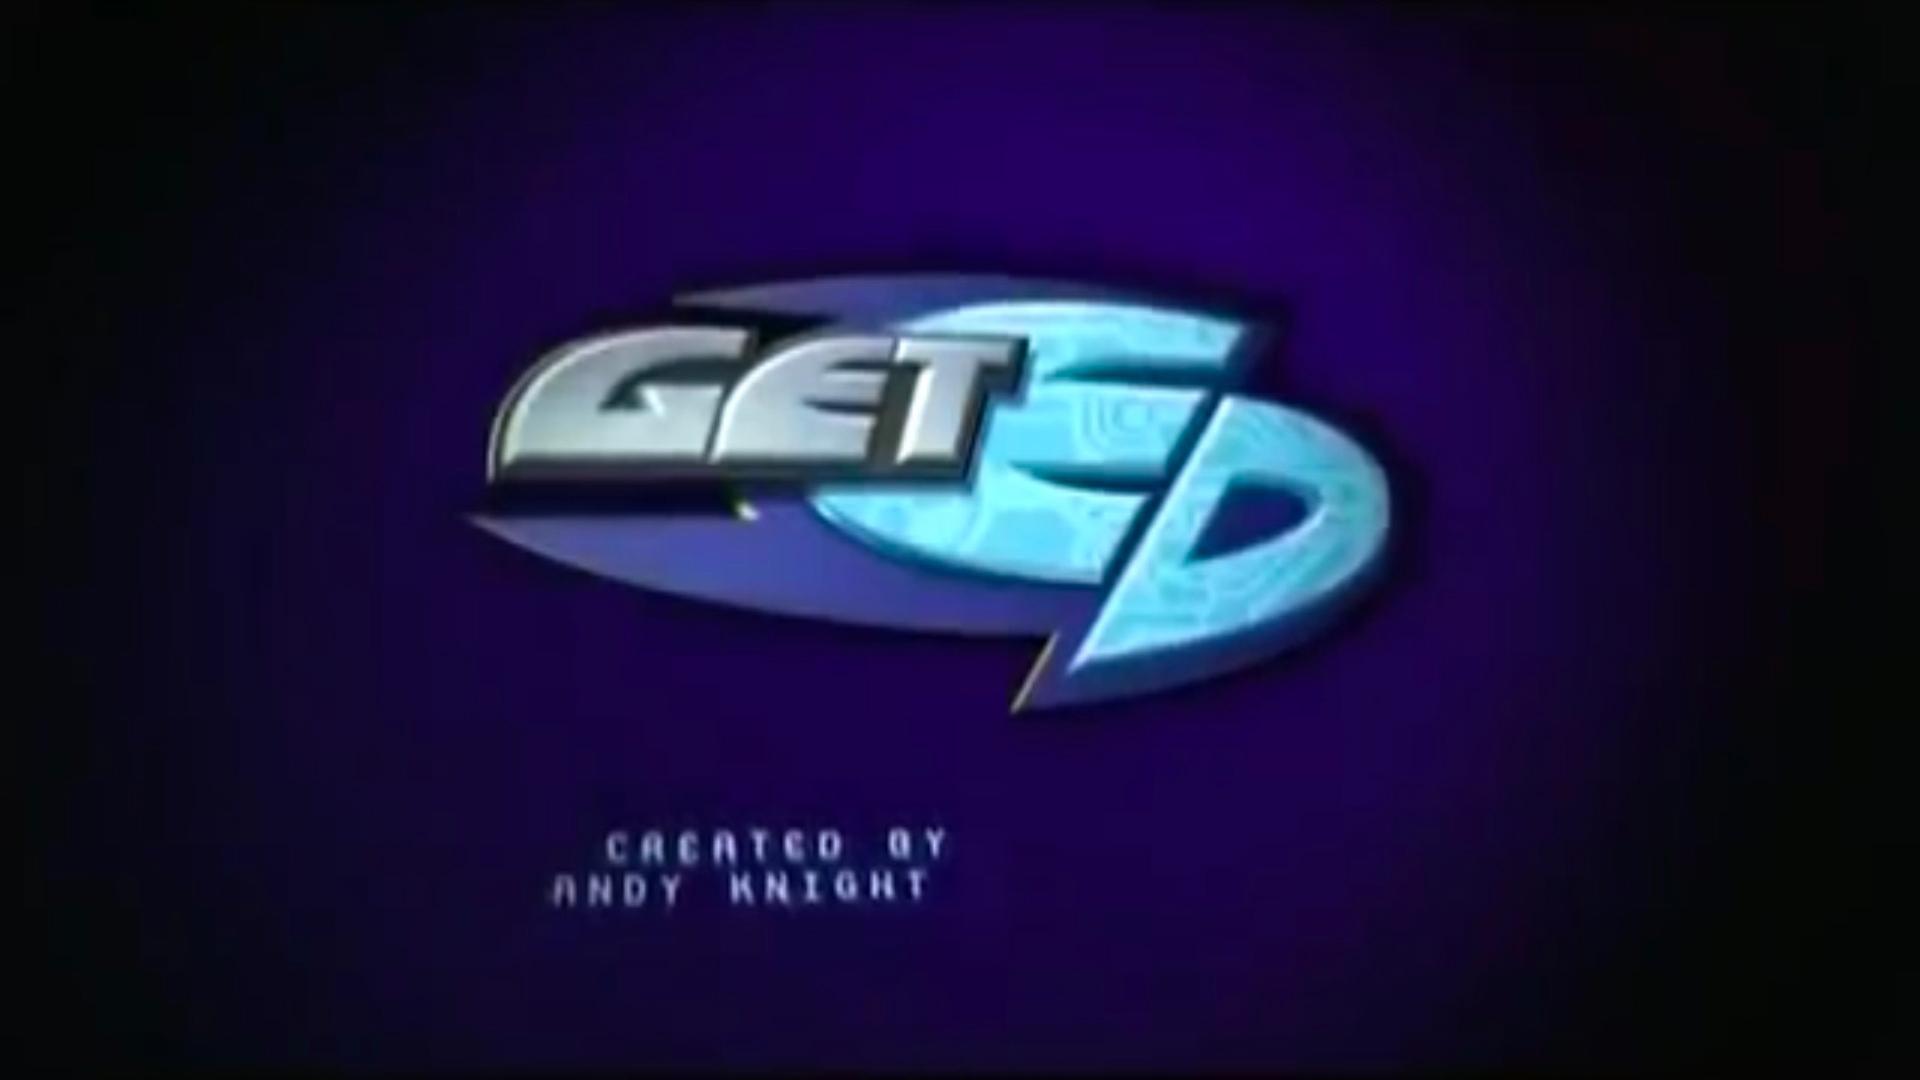 Get Ed